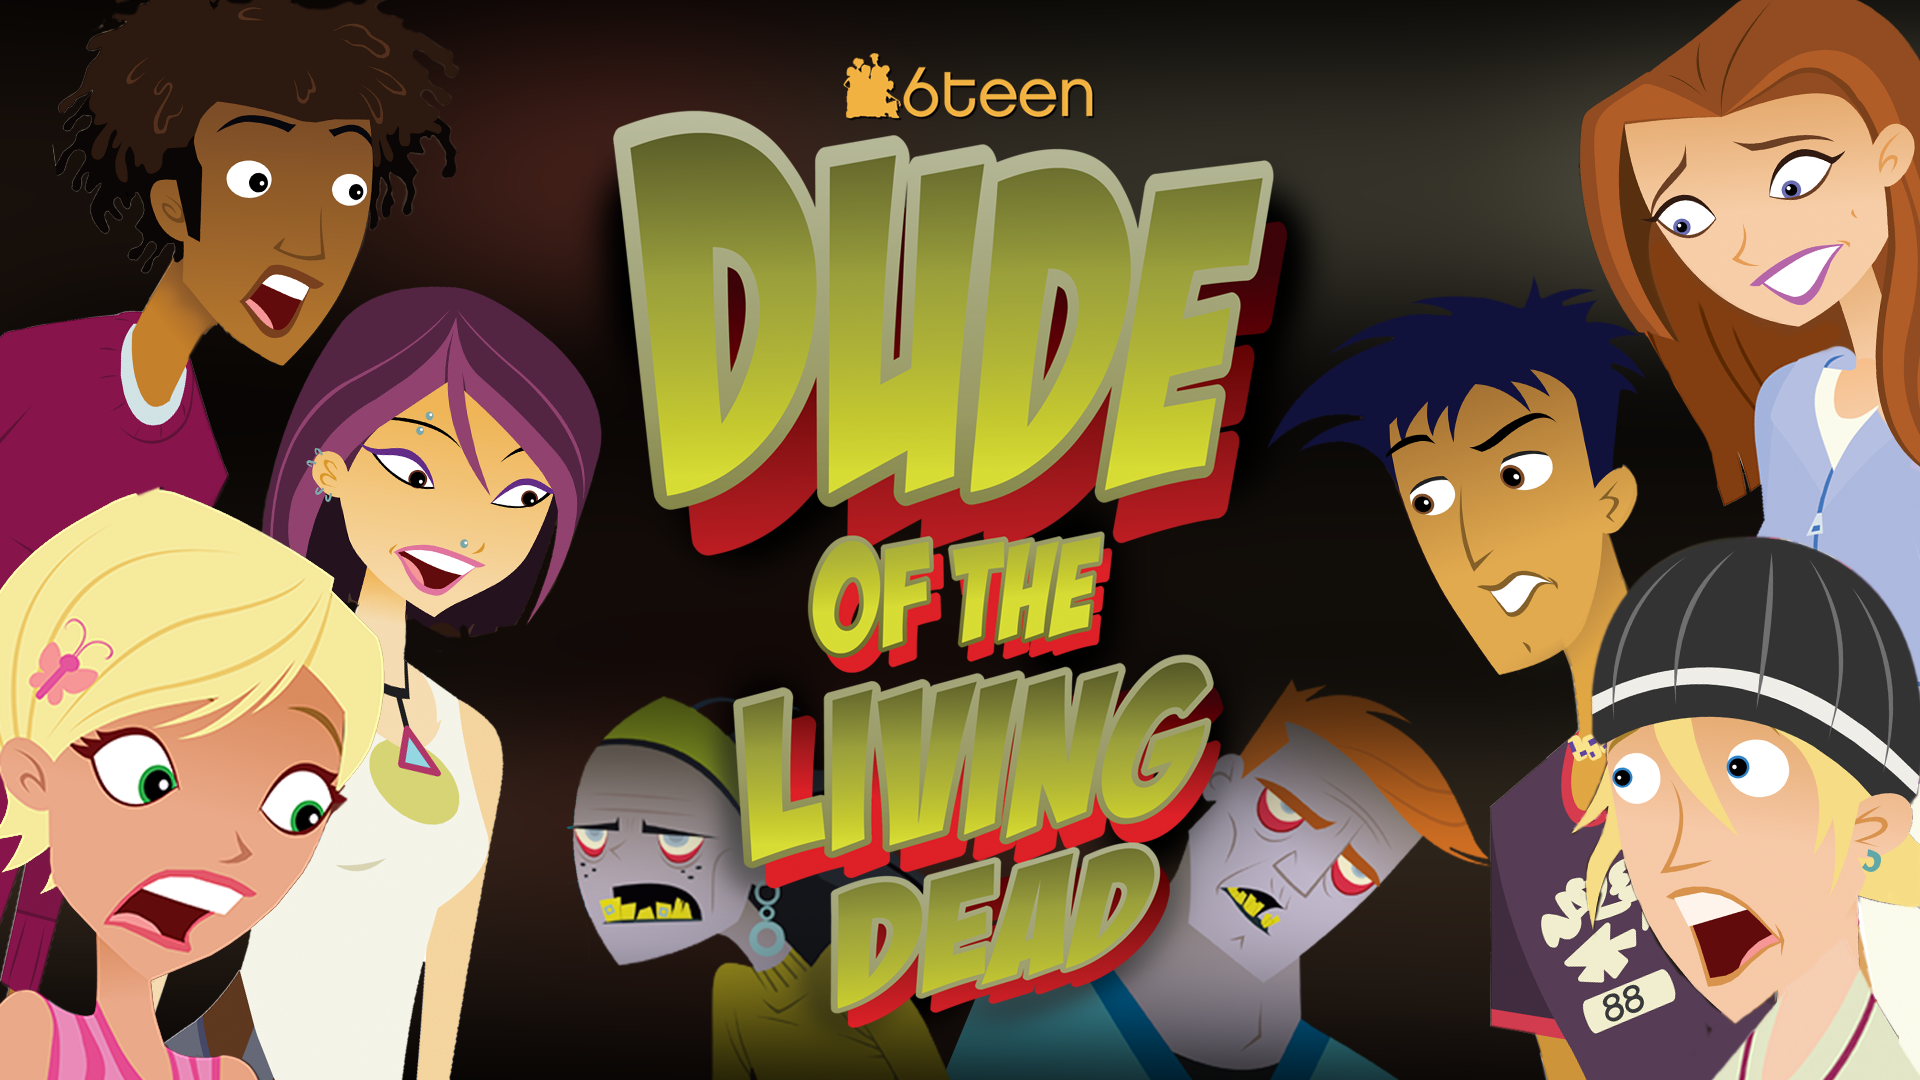 6Teen: Dude Of The Living Dead